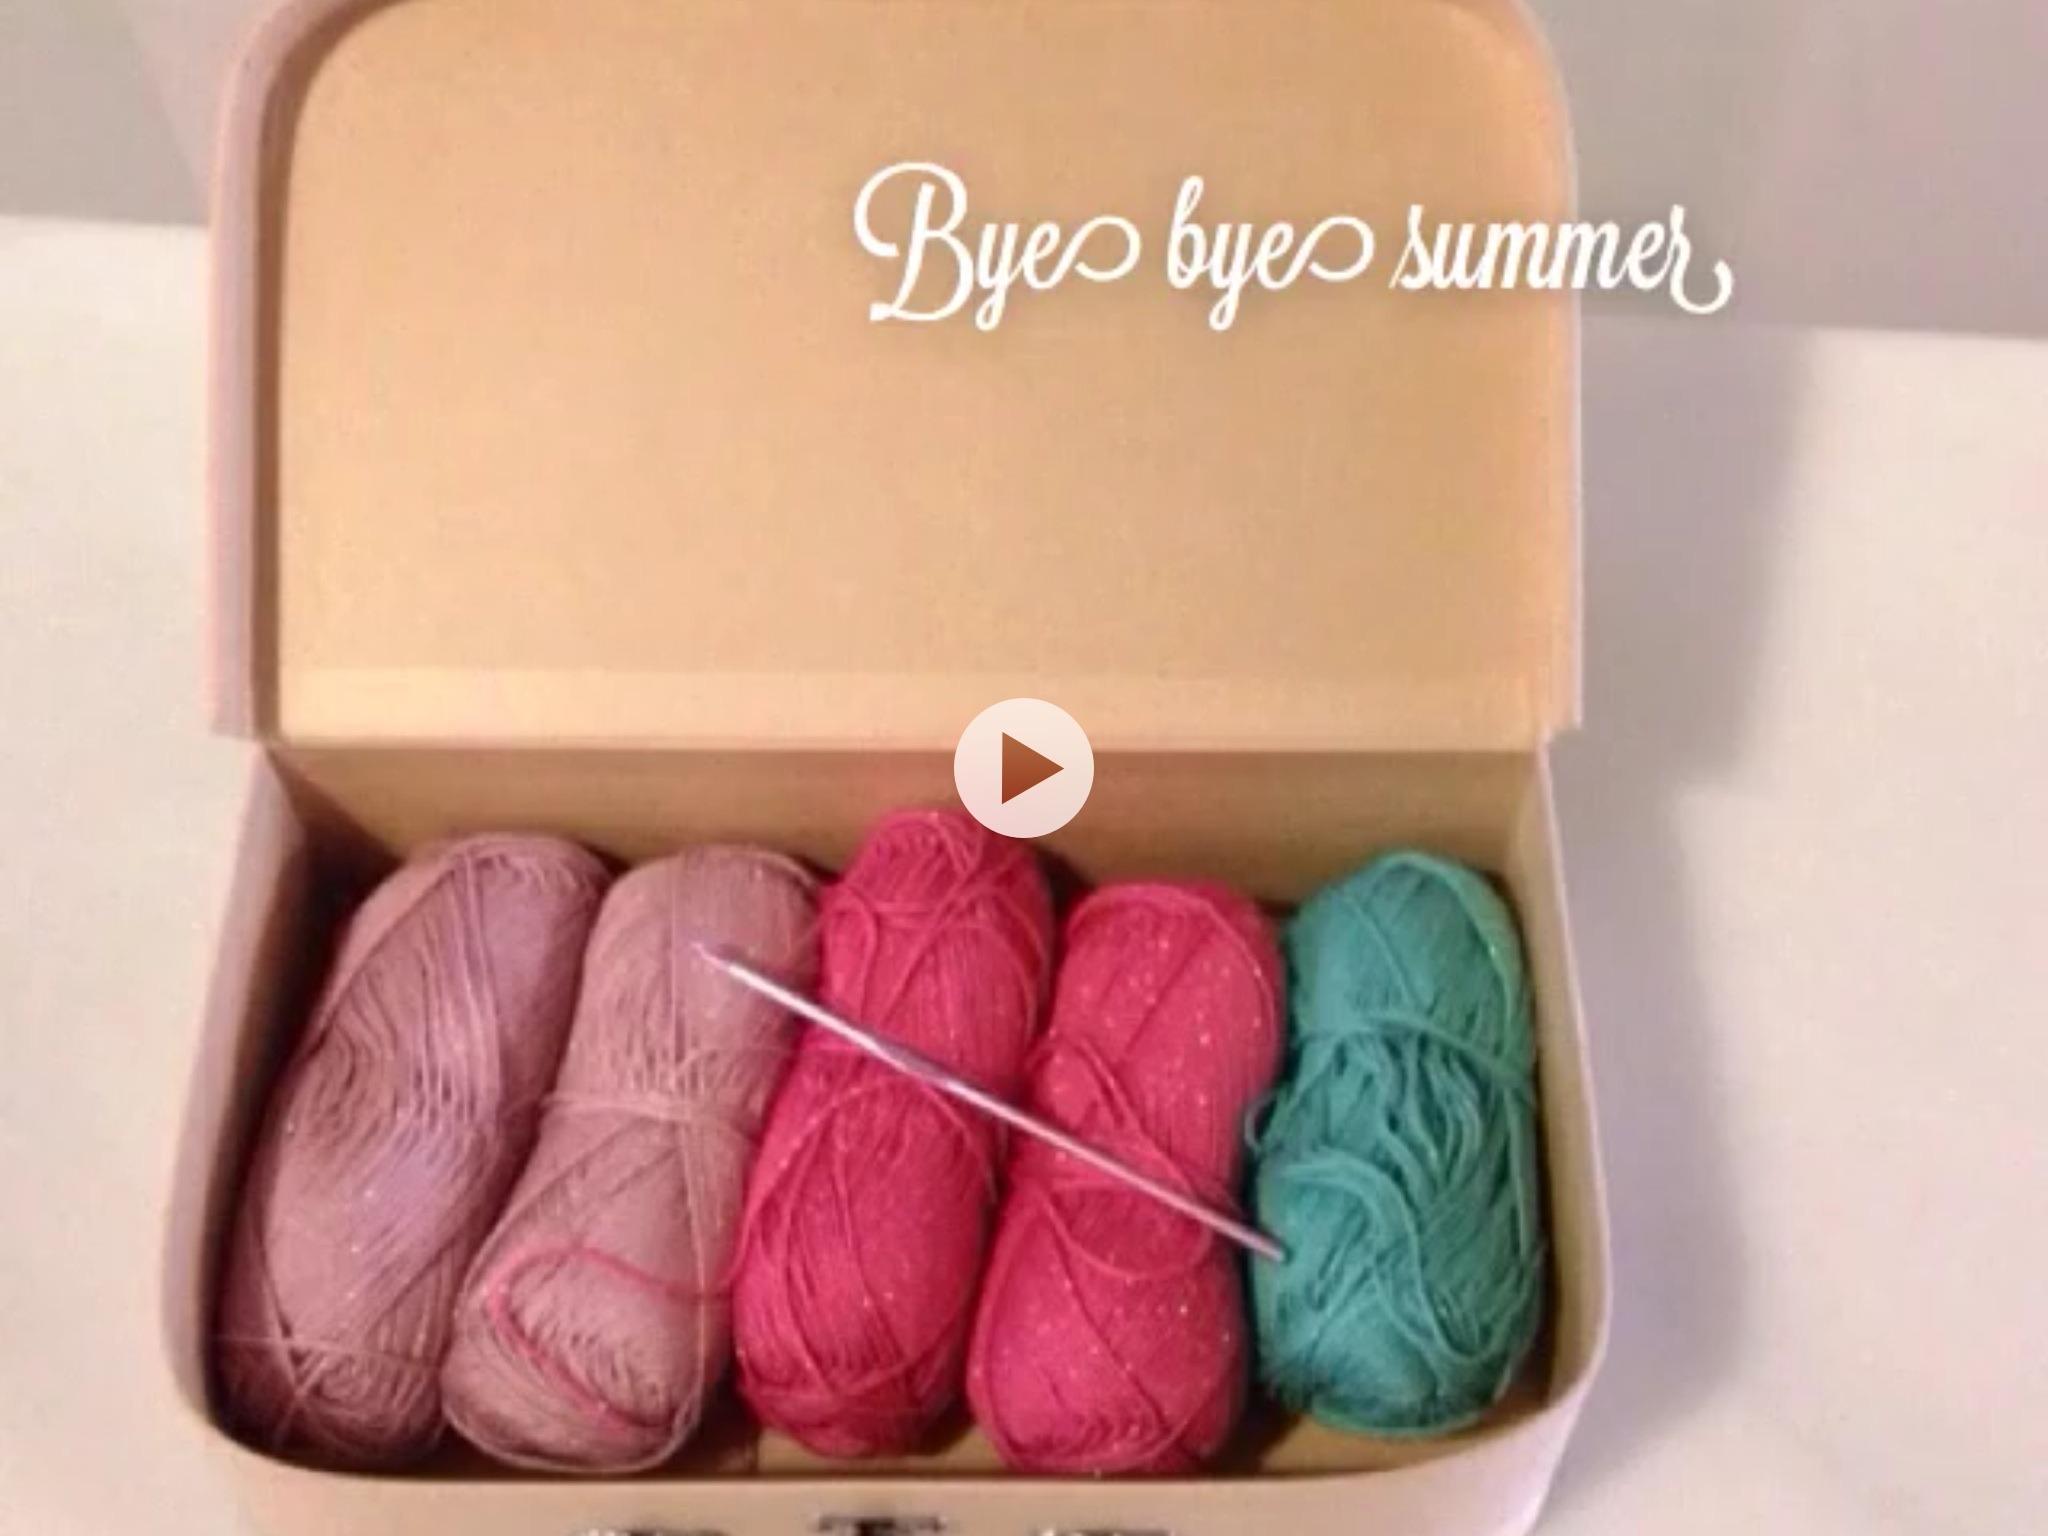 Bye bye summer… Hola rutina!